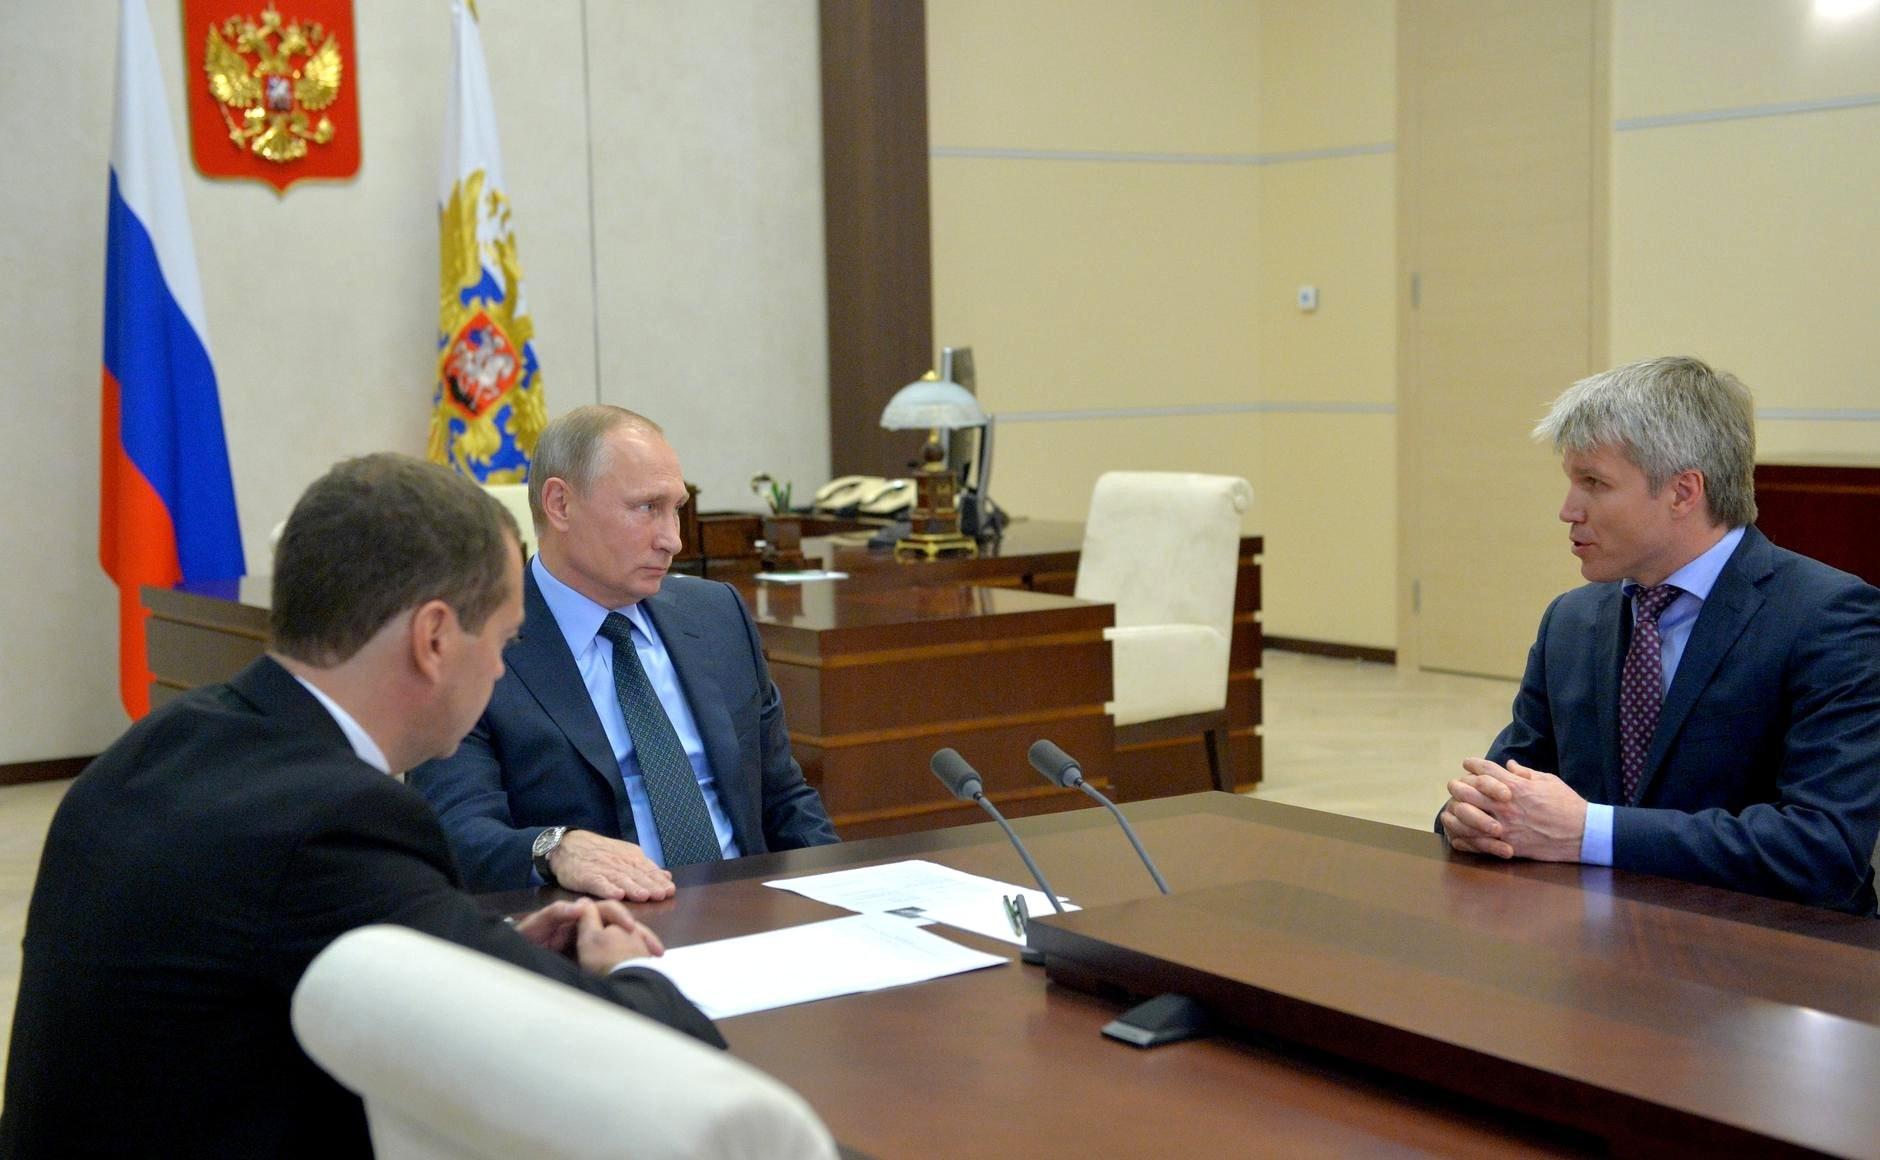 Pavel Kolobkov, ministro do Esporte da Rússia, renuncia